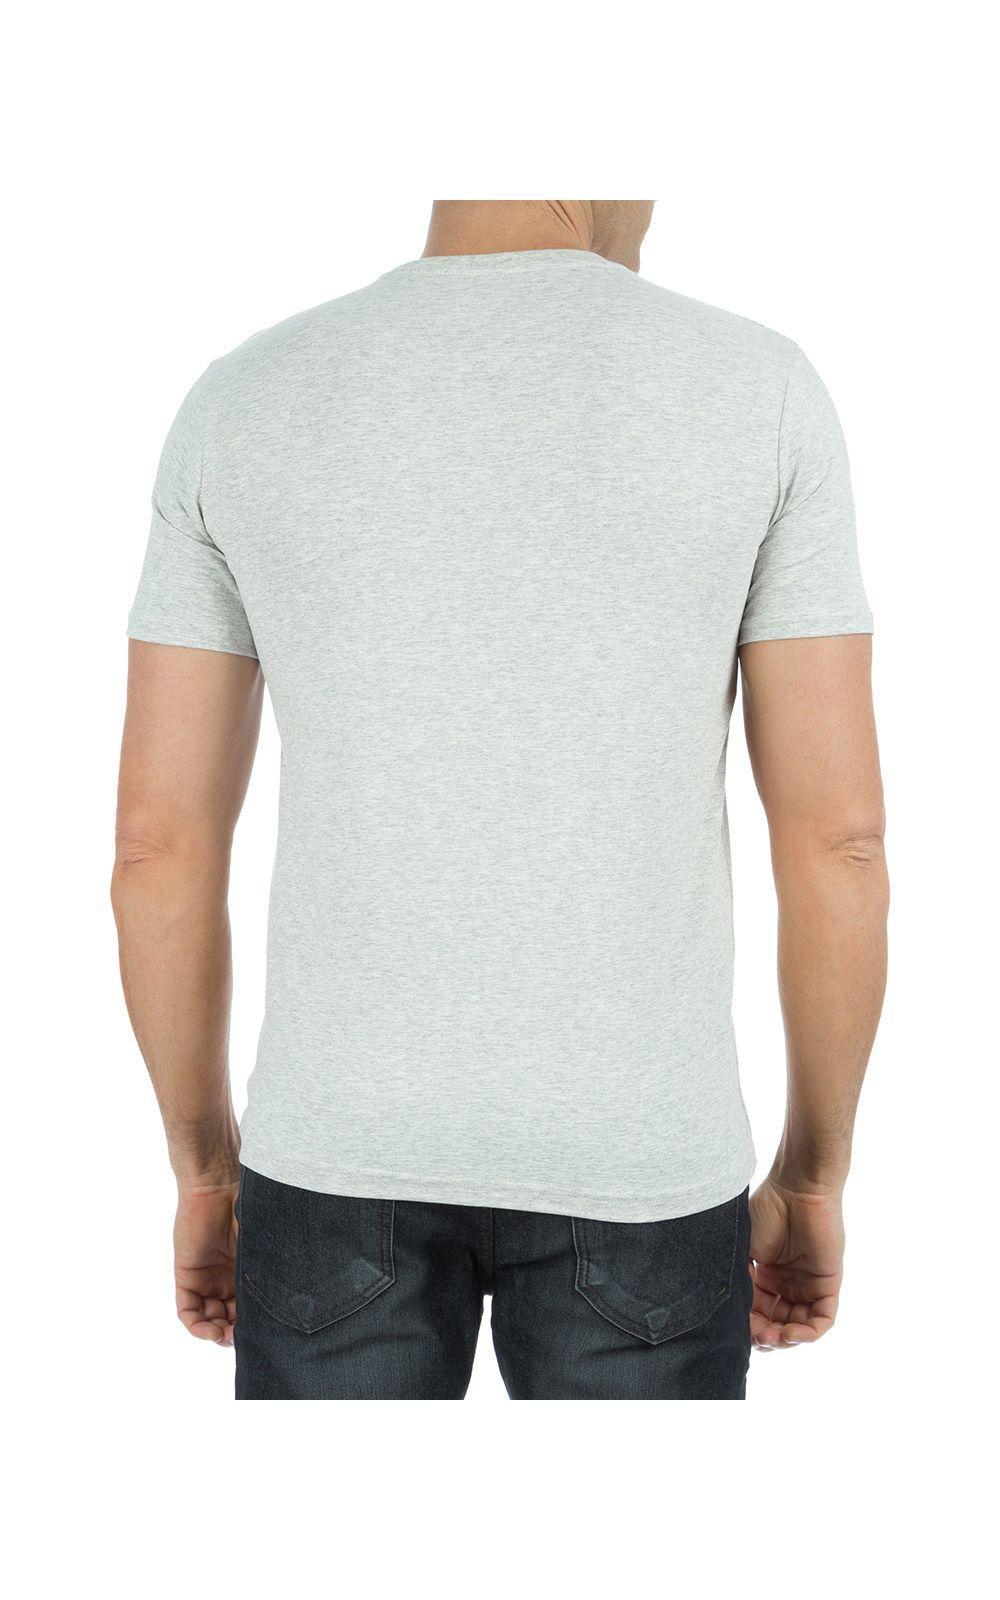 Foto 2 - Camiseta Masculina Cinza Claro